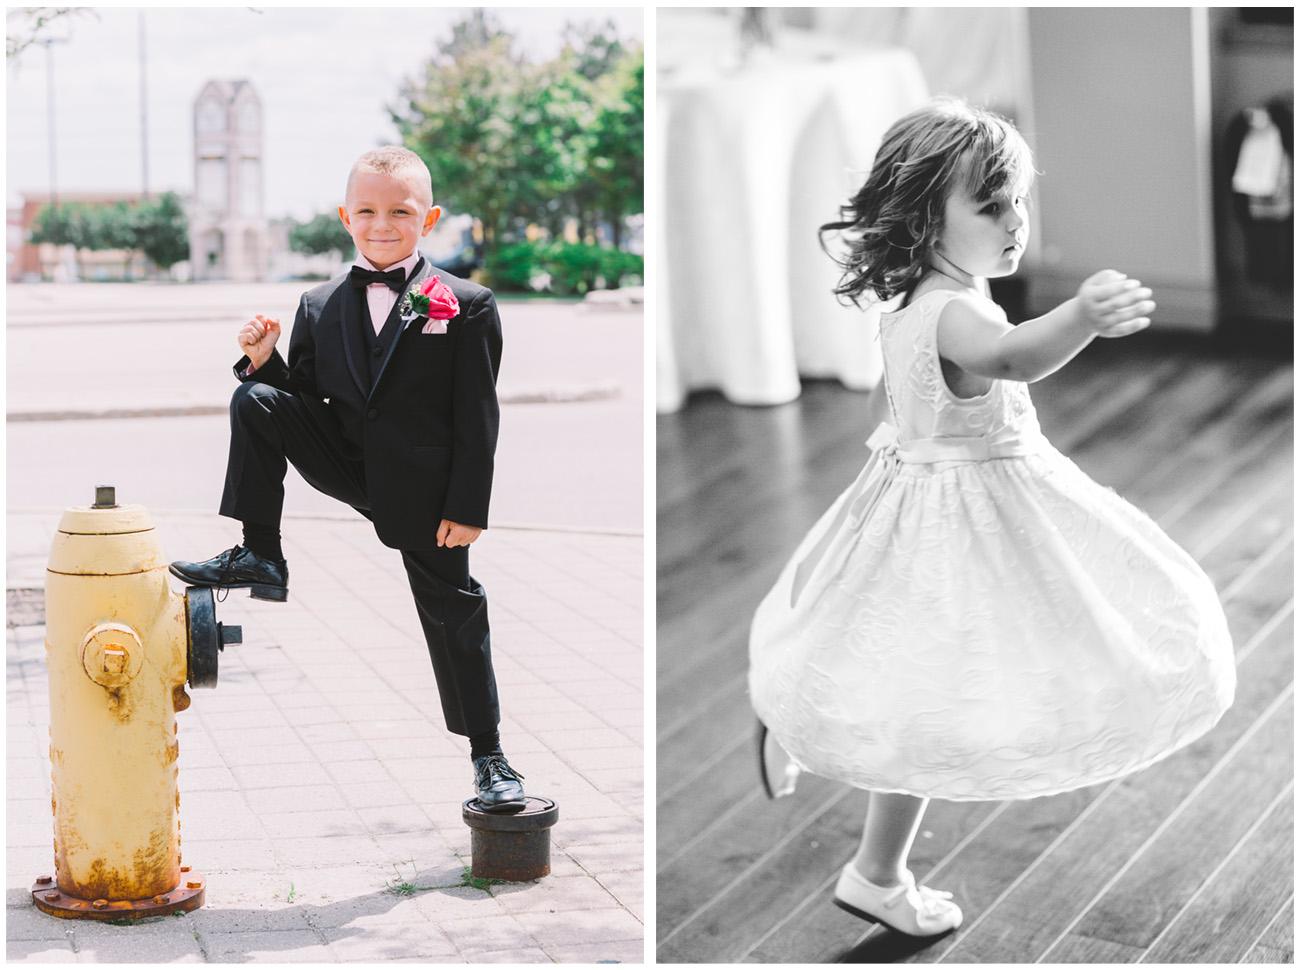 Kids at a Toronto Wedding